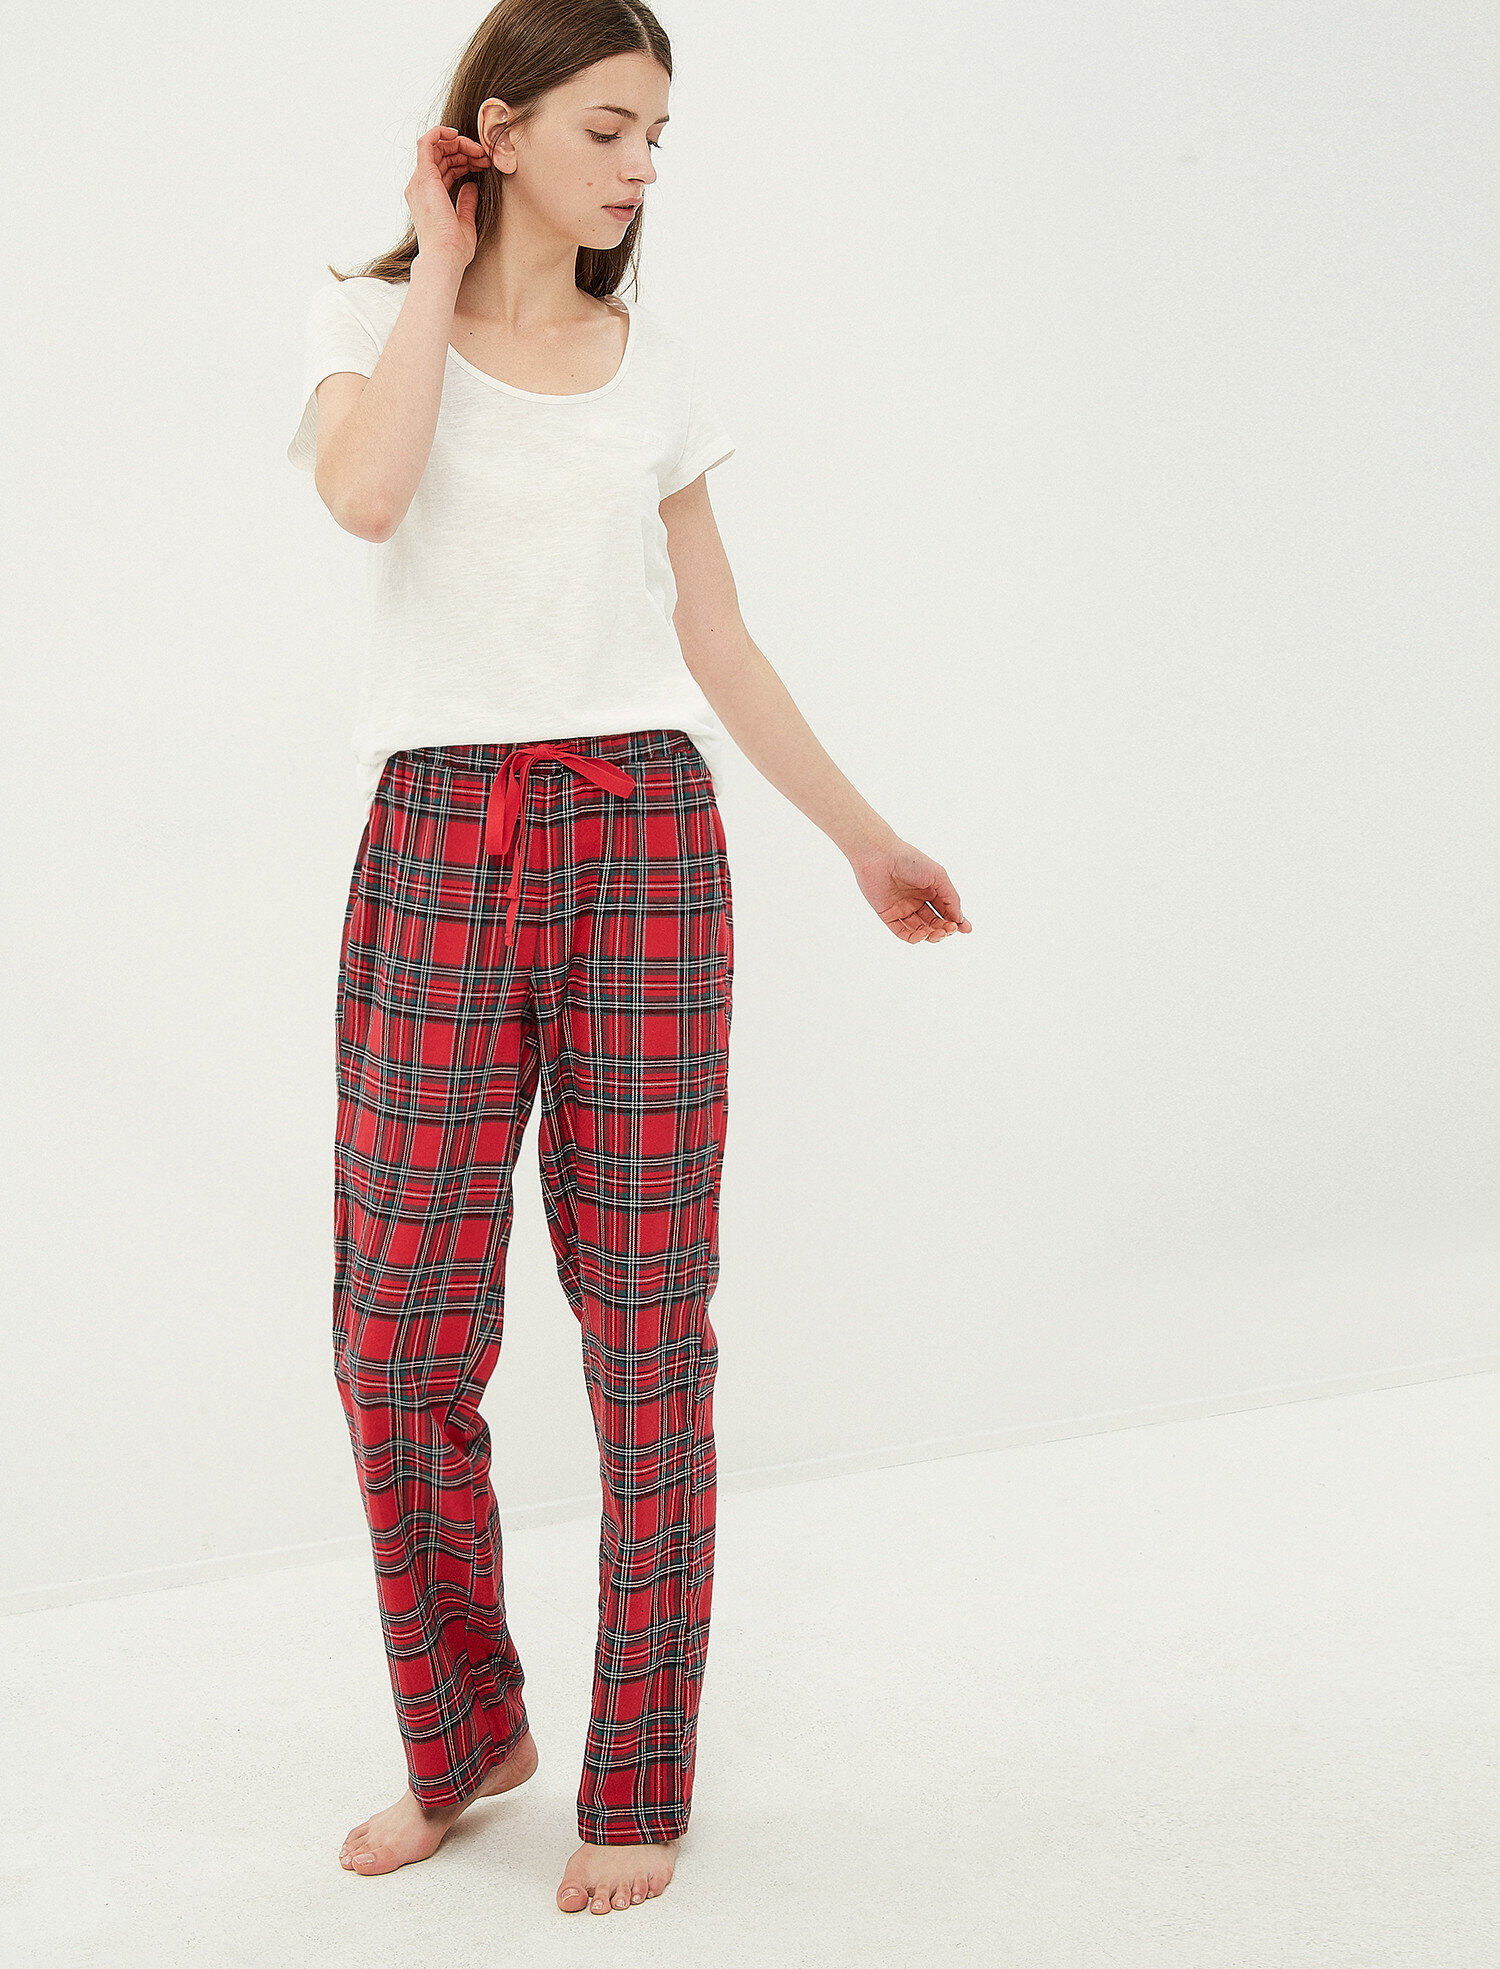 2855d0daa1d92 Kırmızı Bayan Kareli Pijama Altı 7KLK71823MW12U | Koton